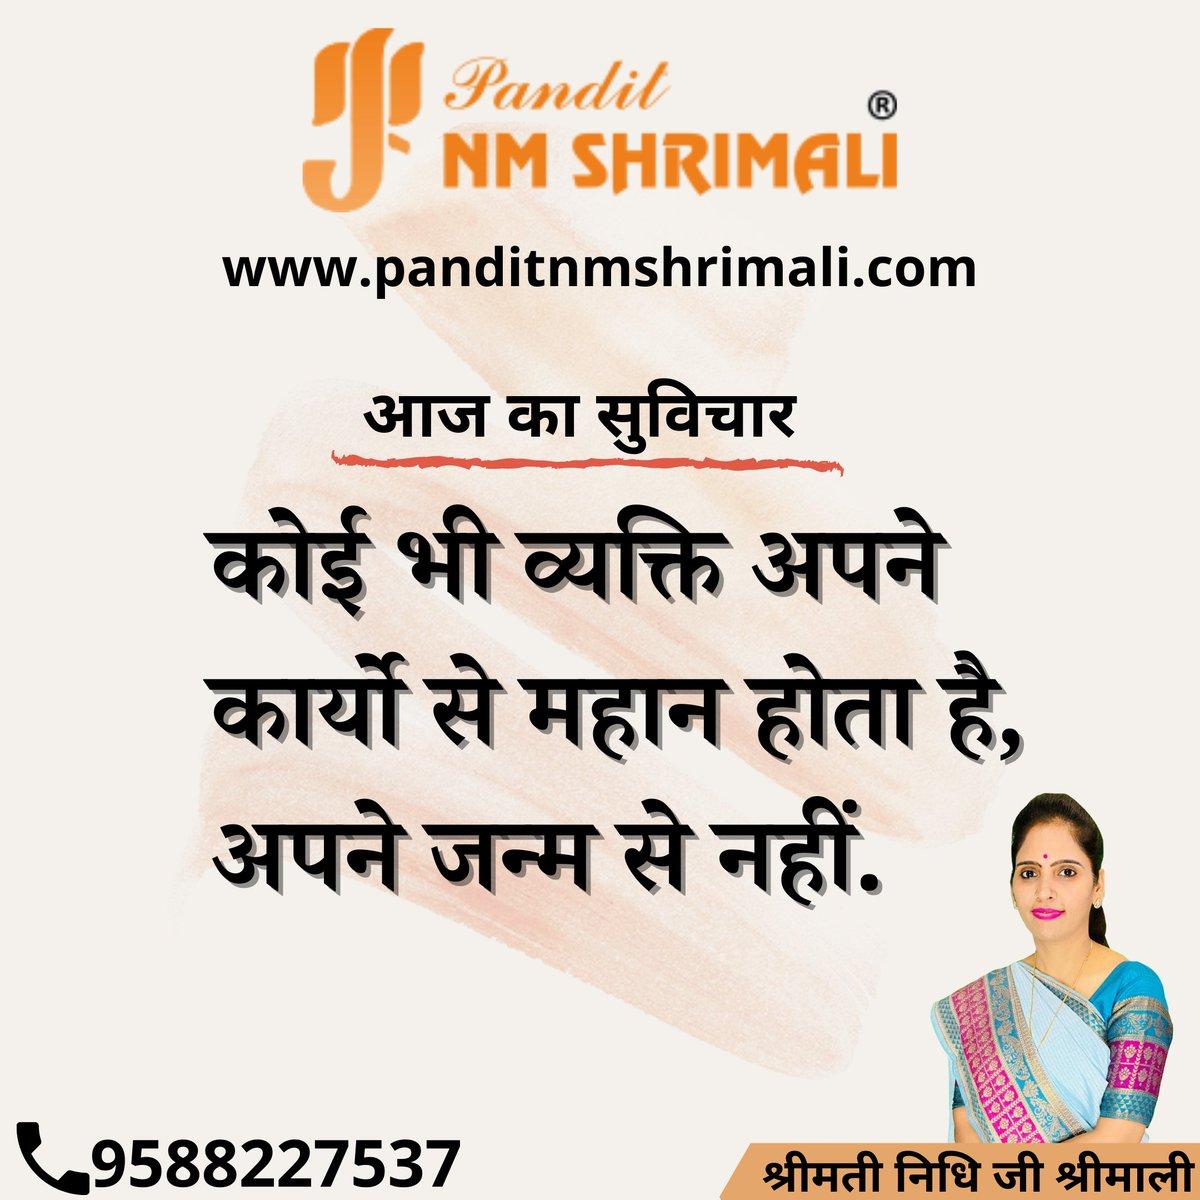 आज का सुविचार #best_astrologer #energized #panditnmshrimali #kundali_vishleshan #nidhi_shrimali #horoscope_making #kundali_milan #suvichar #सुविचार https://t.co/5s0Zw3W0vB